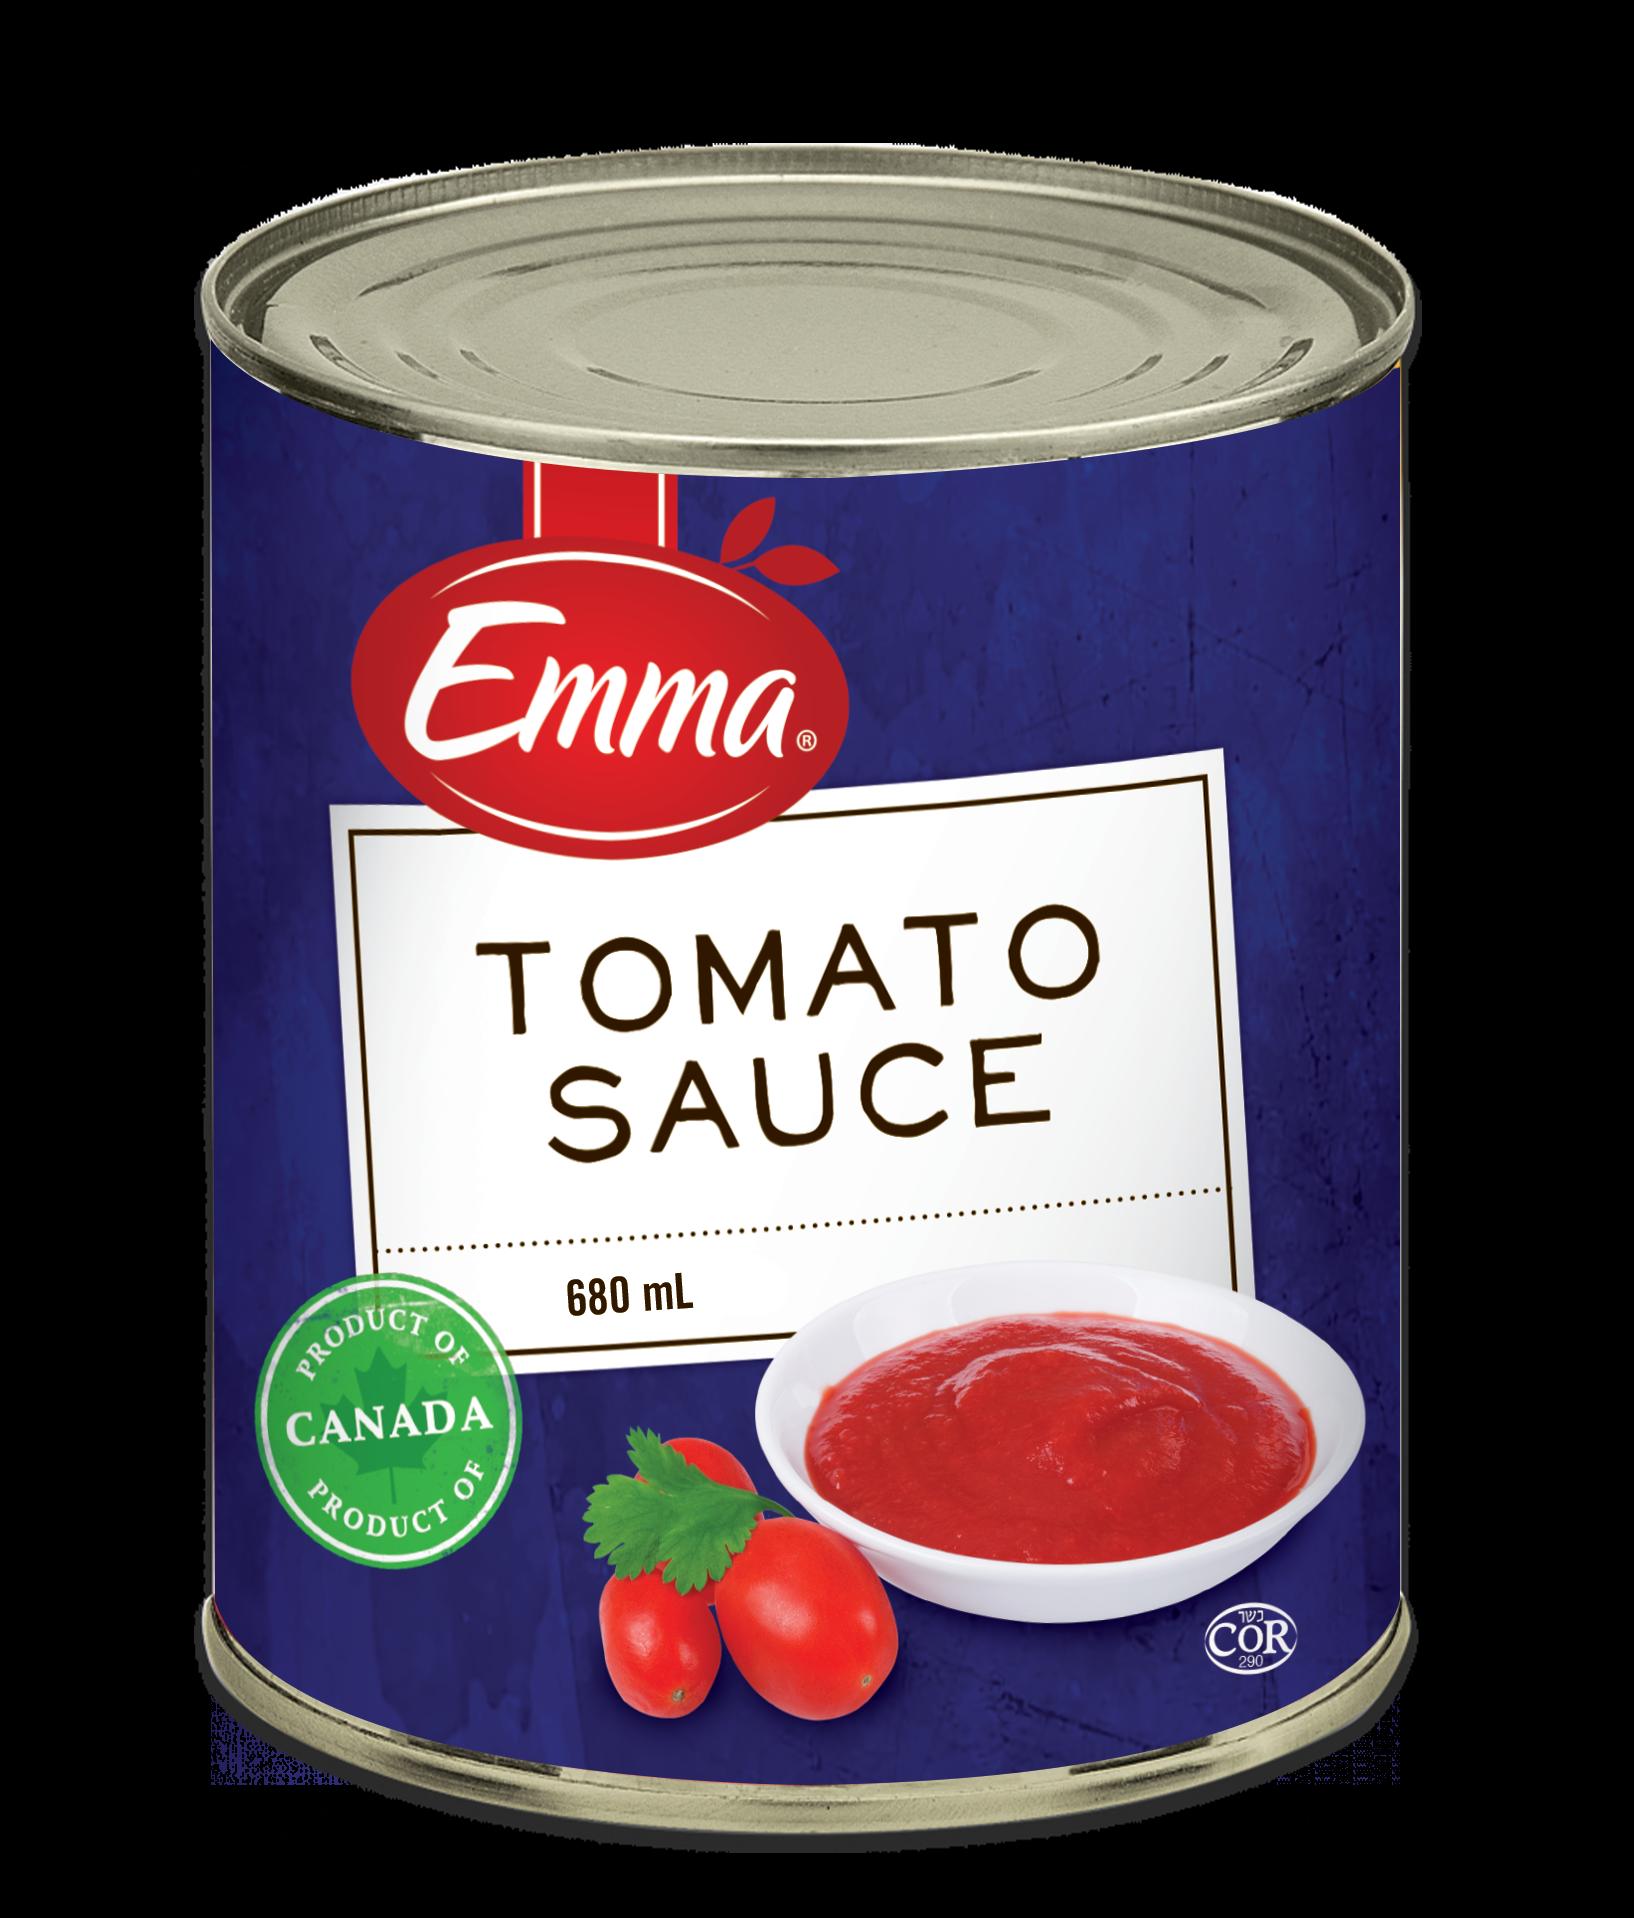 Emma Tomato Sauce